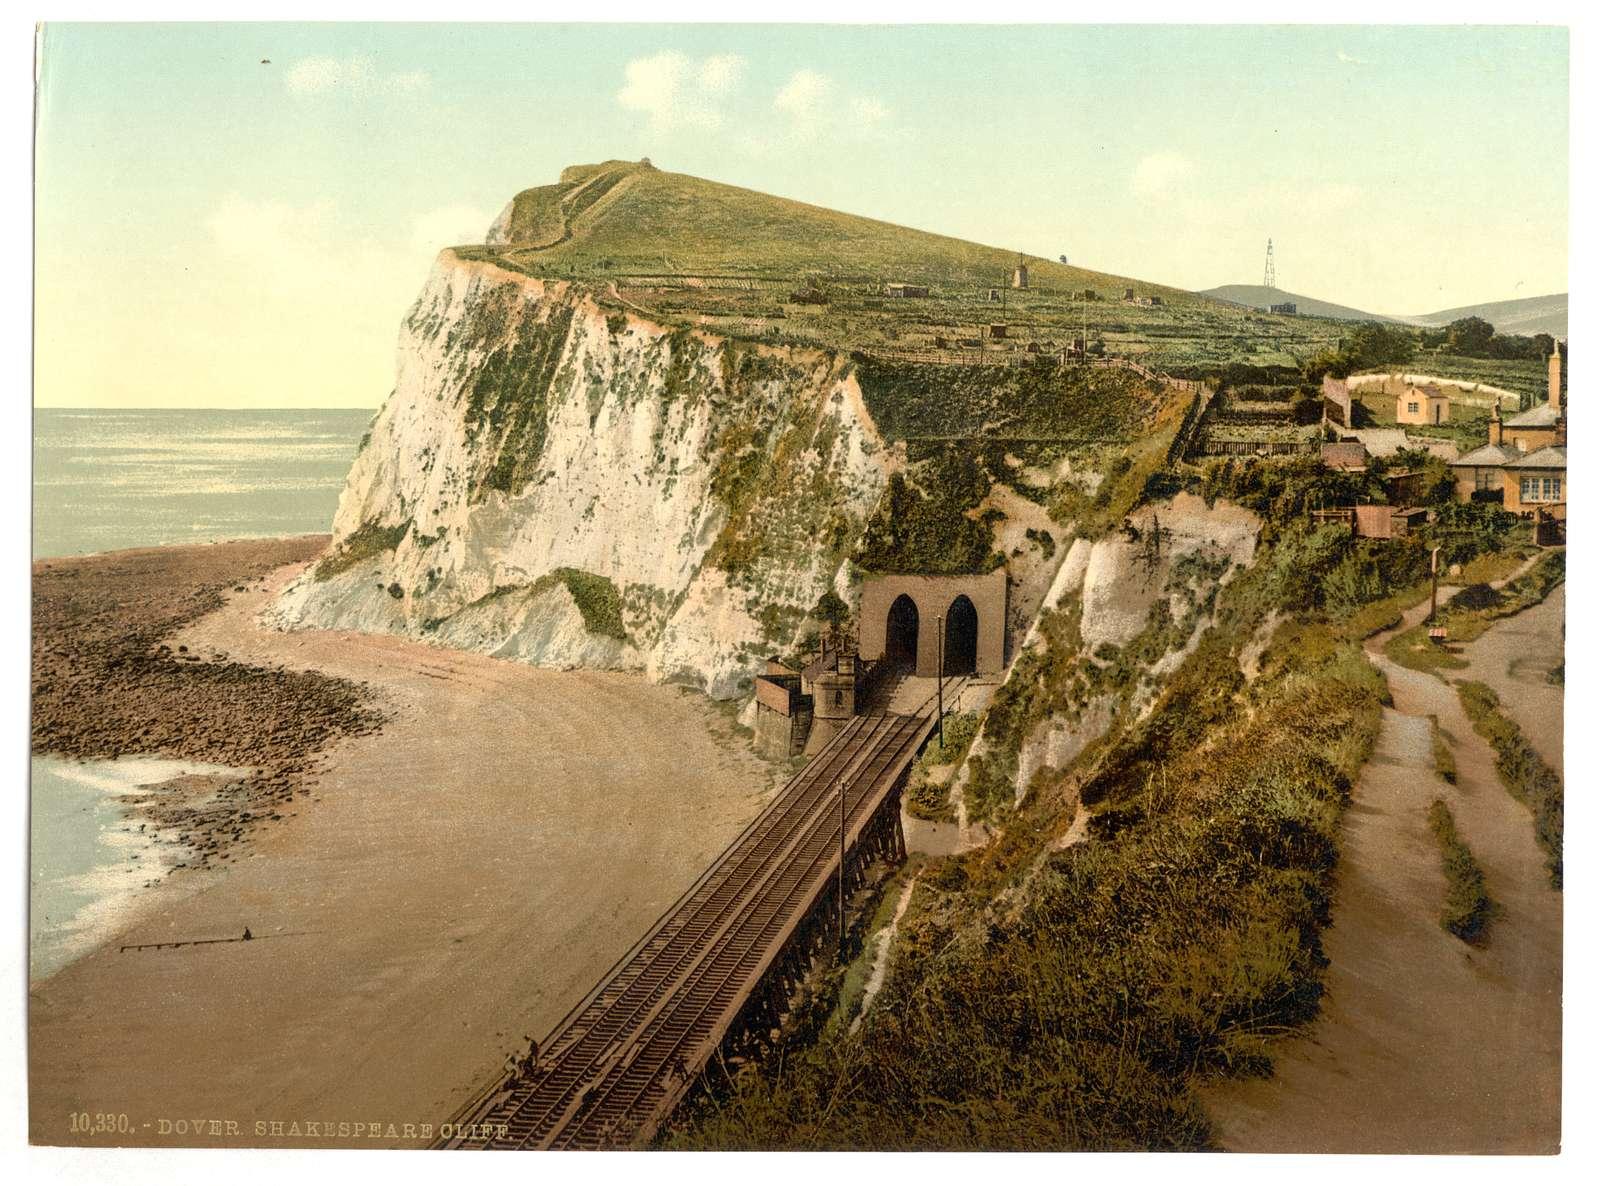 [Shakespeare's Cliff, Dover, England]